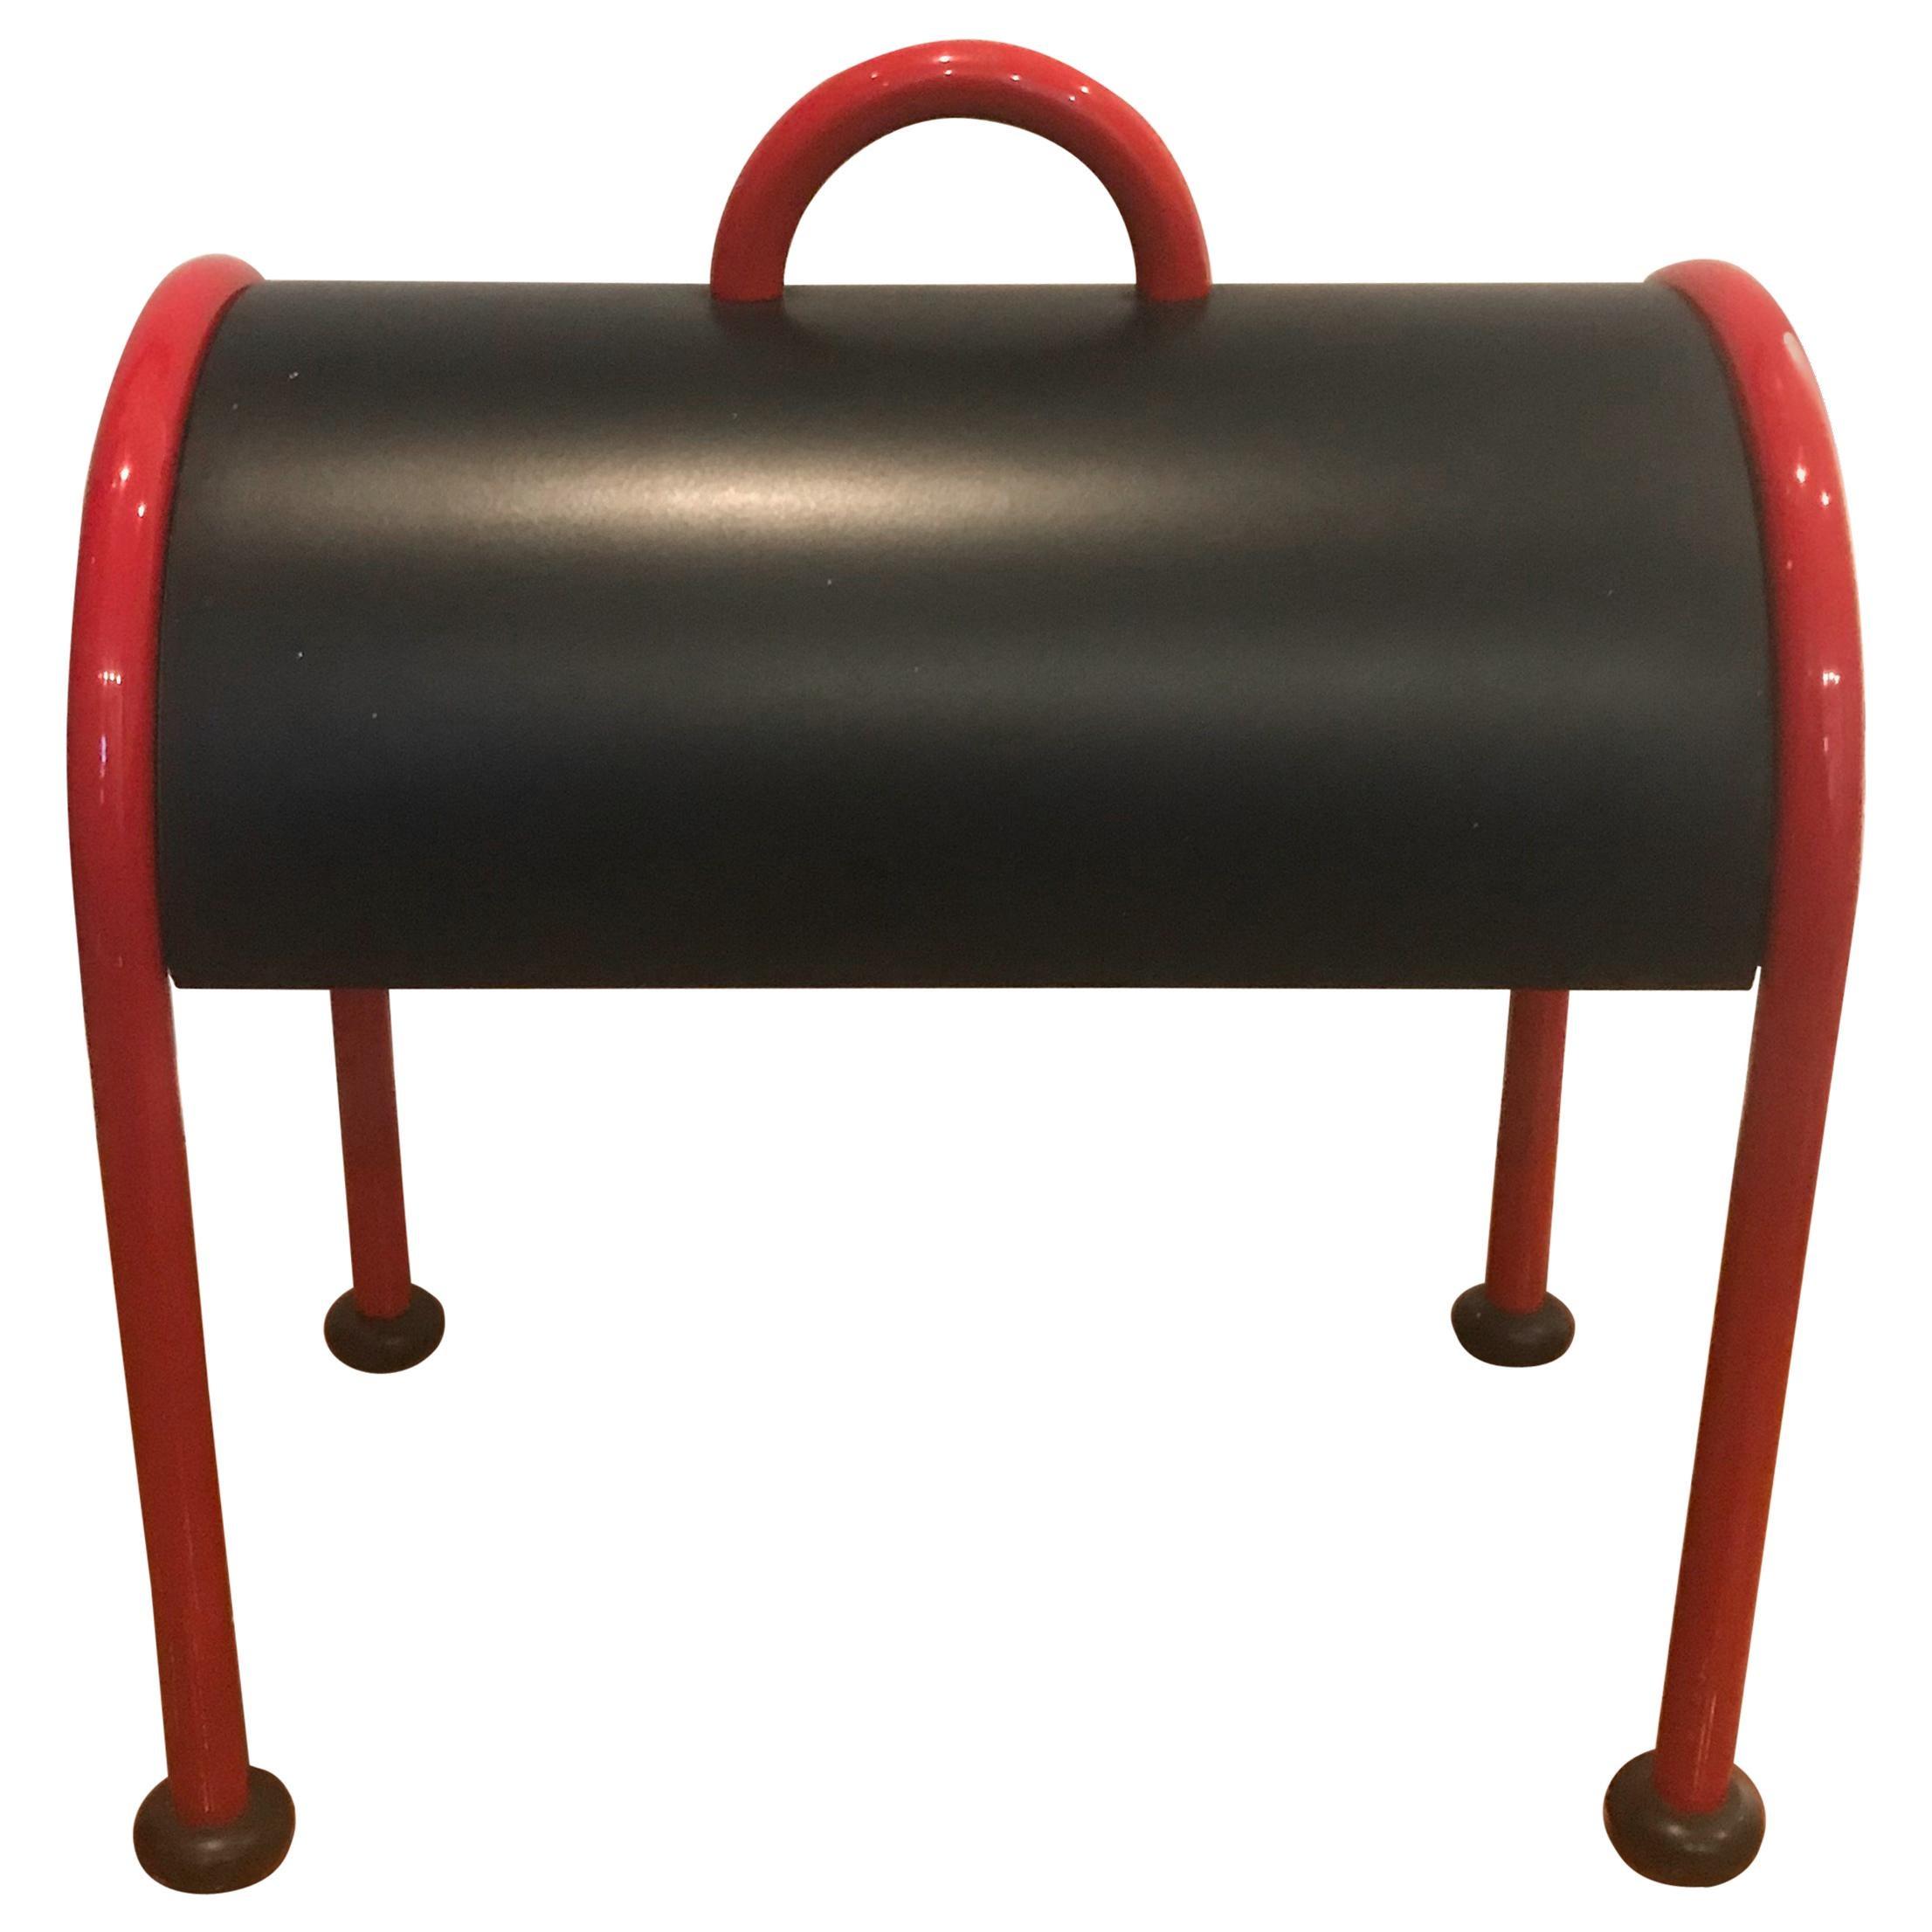 "Table Lamp ""VALIGIA"" Designed in 1977 by Ettore Sottsass for Stilnovo, Italy"